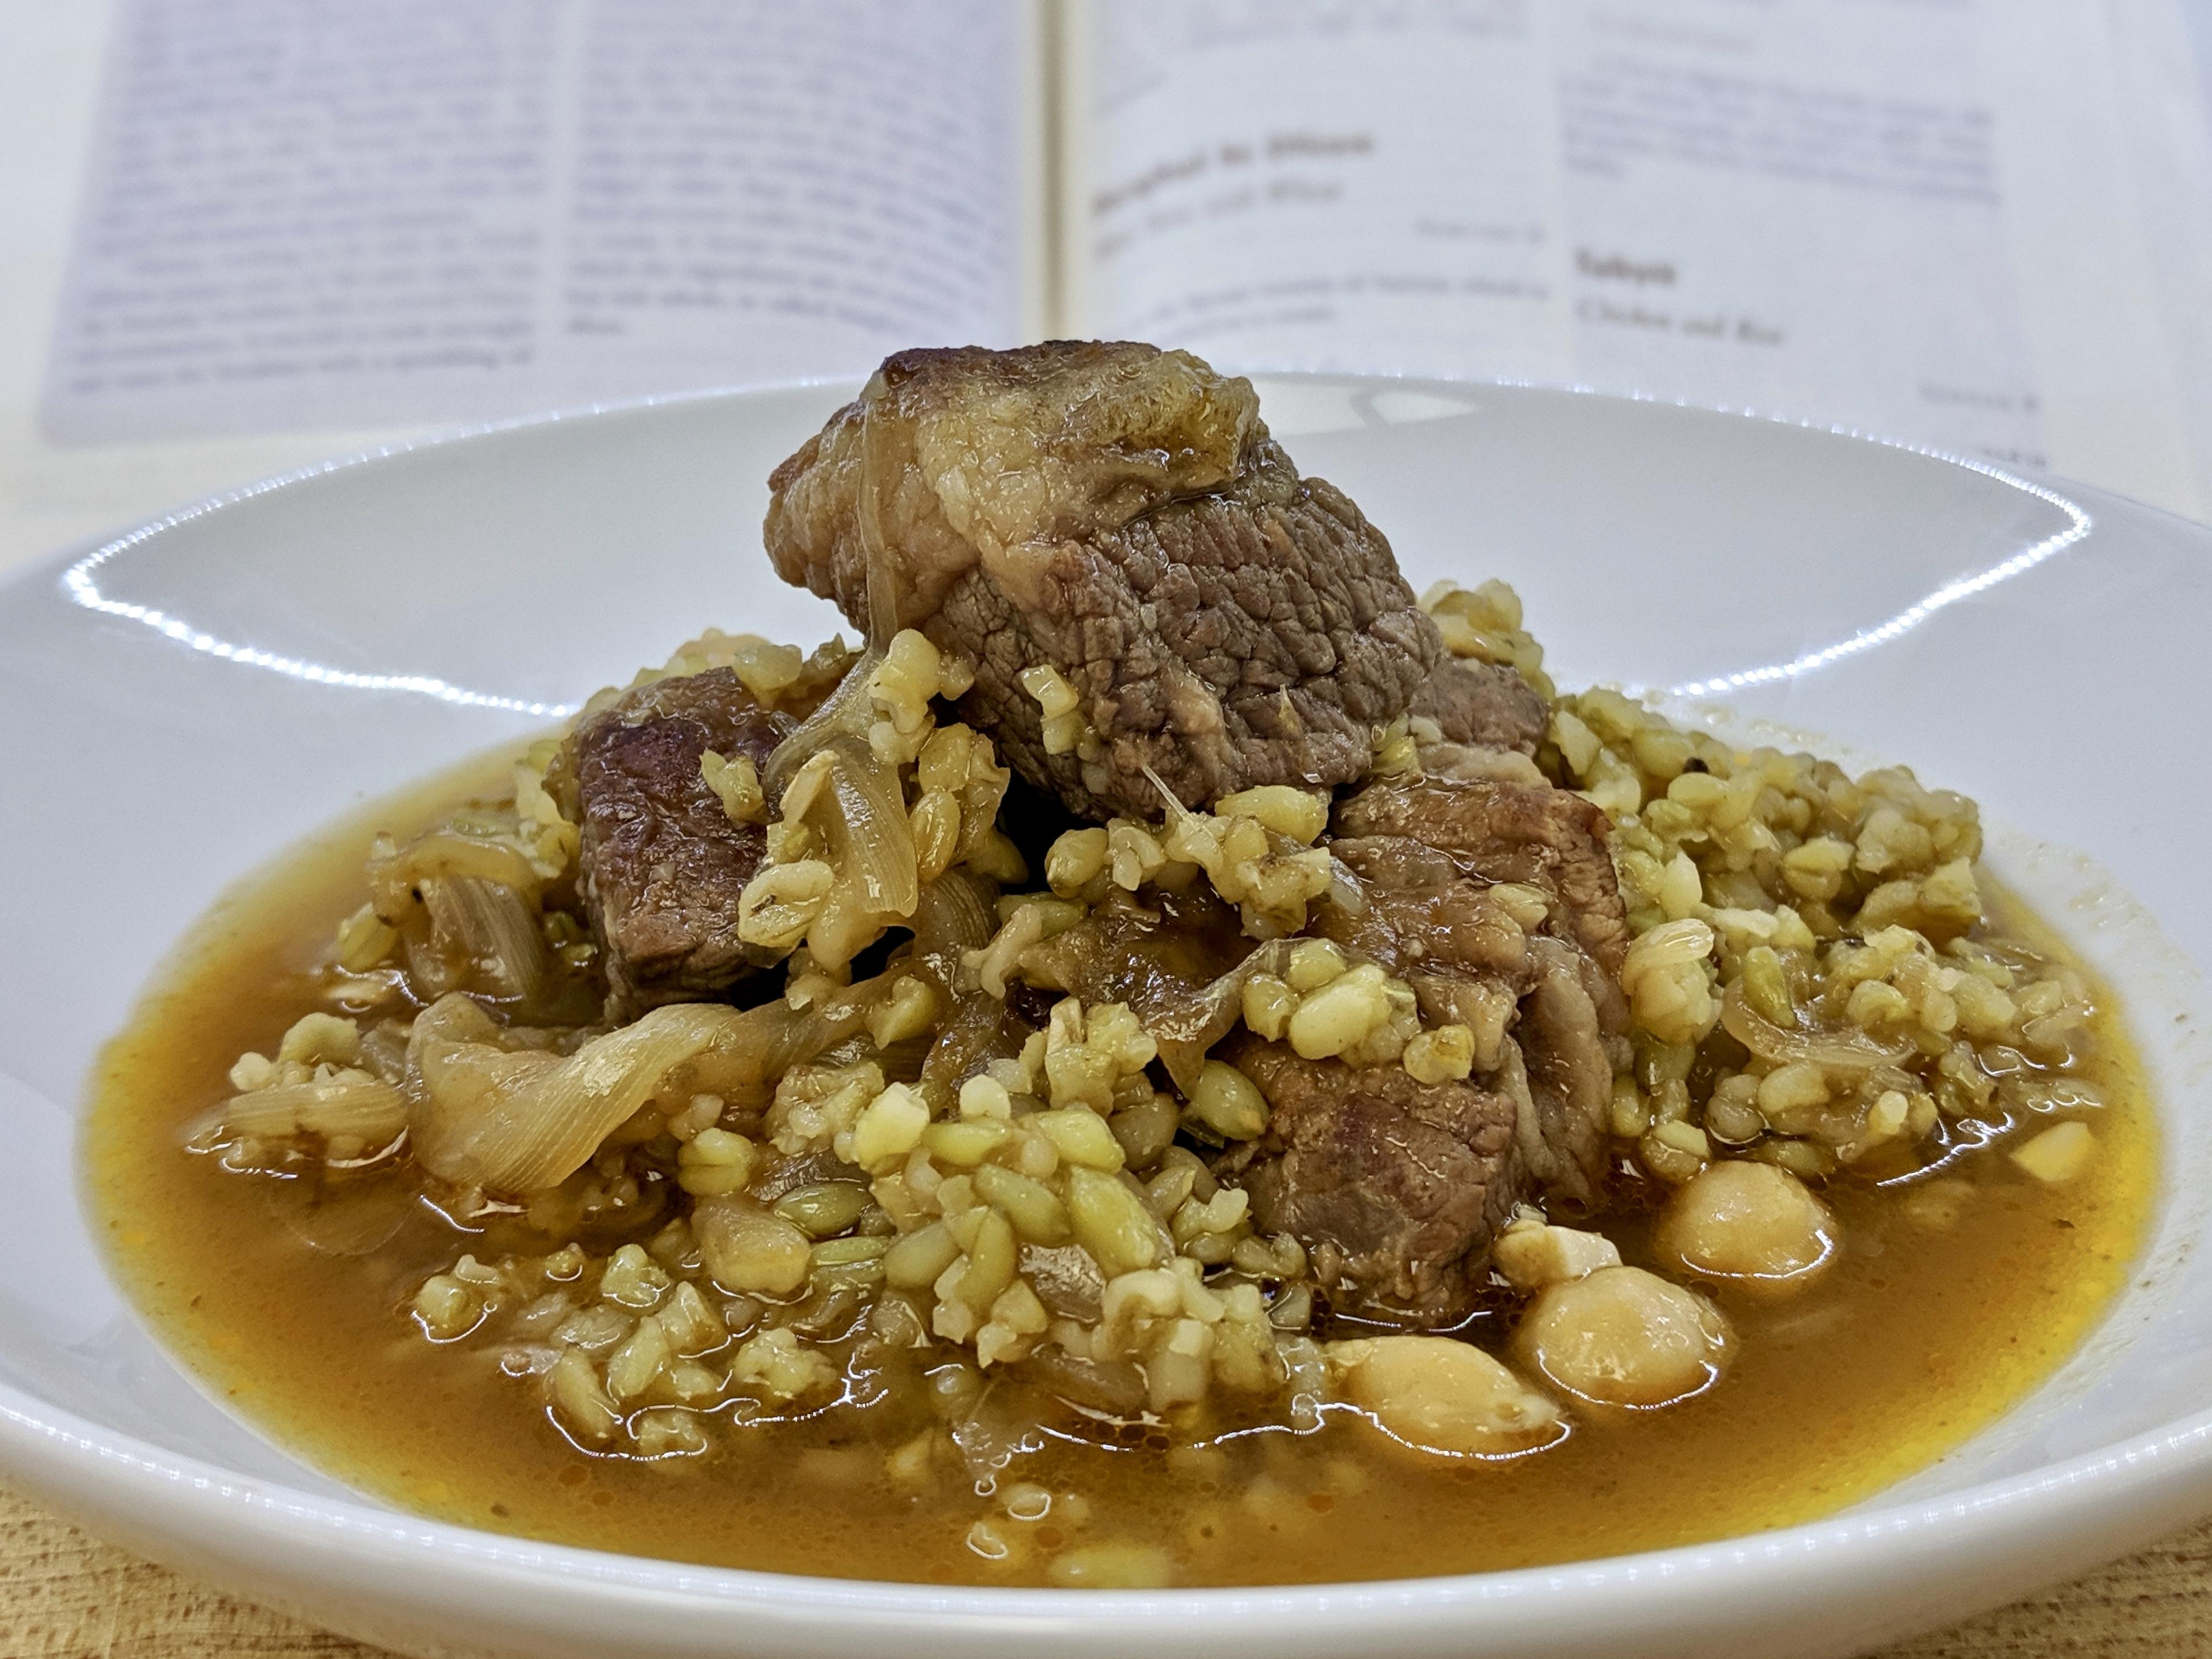 Meal 58 - Burghul bi Dfeen - Meat Stew with Wheat